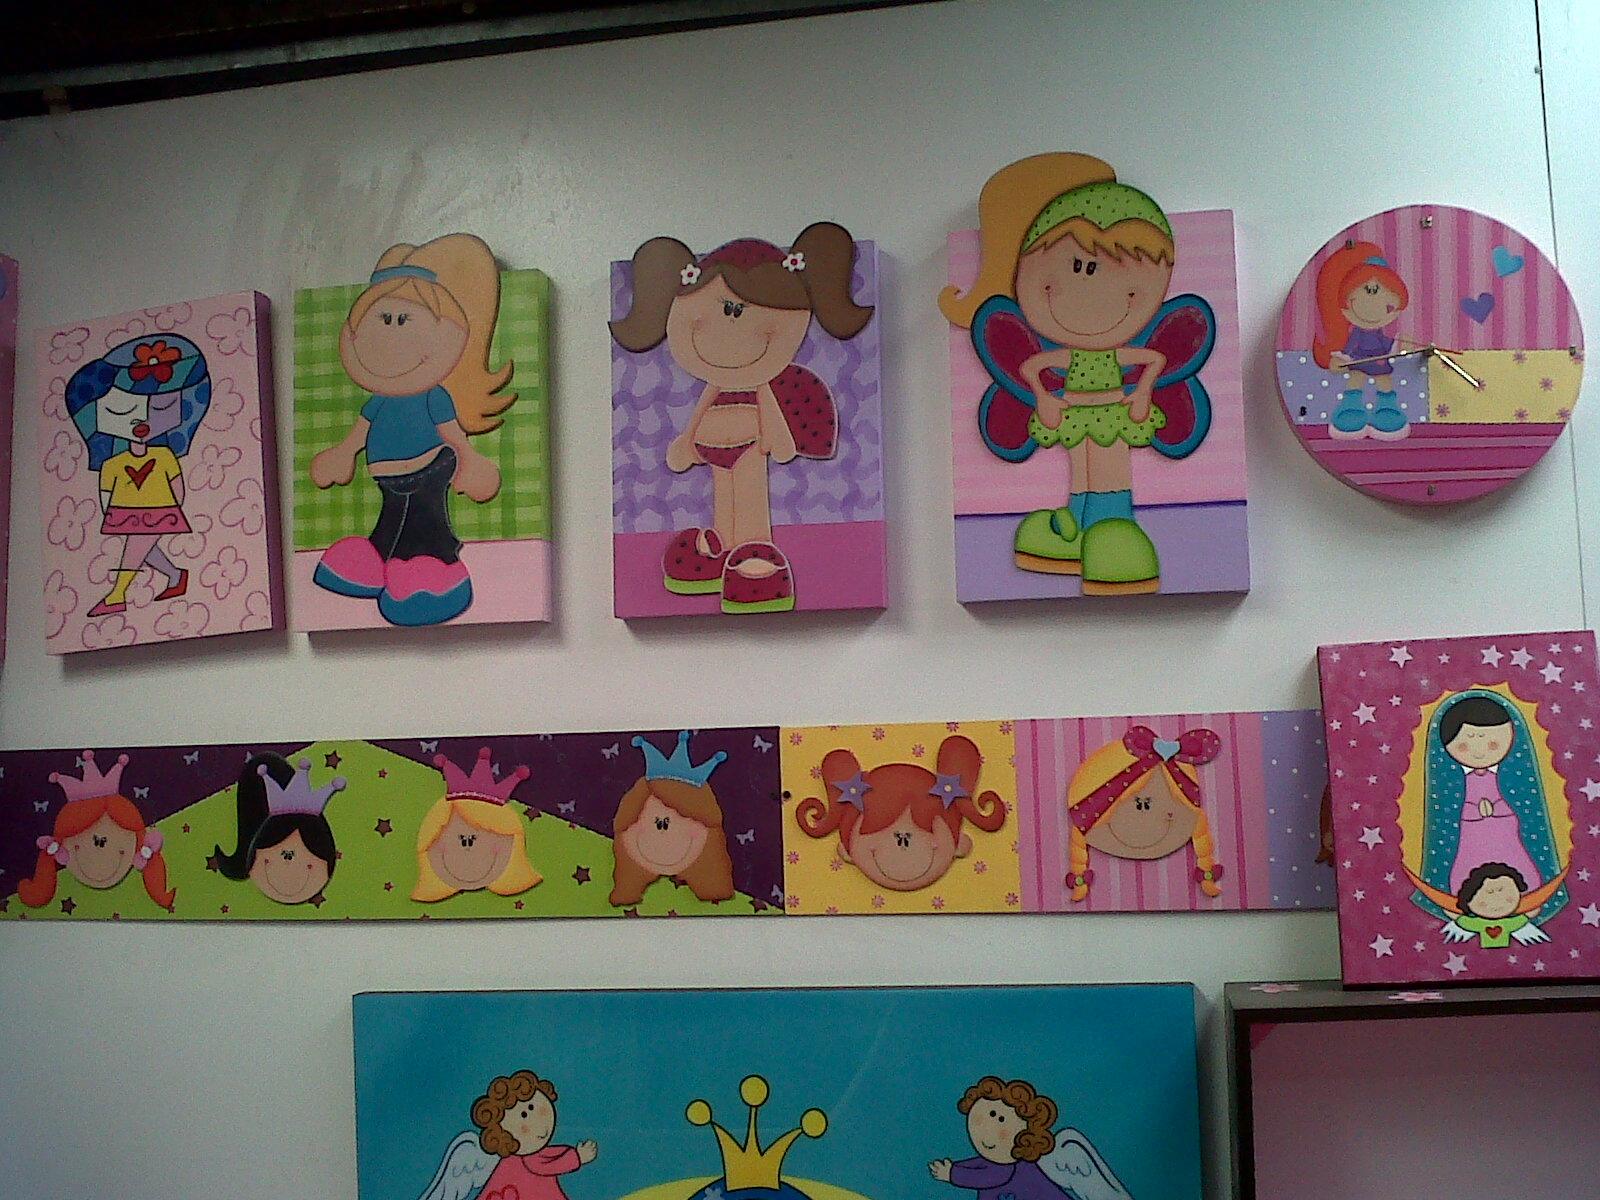 arte pop bogota: decoracion cuarto infantiles